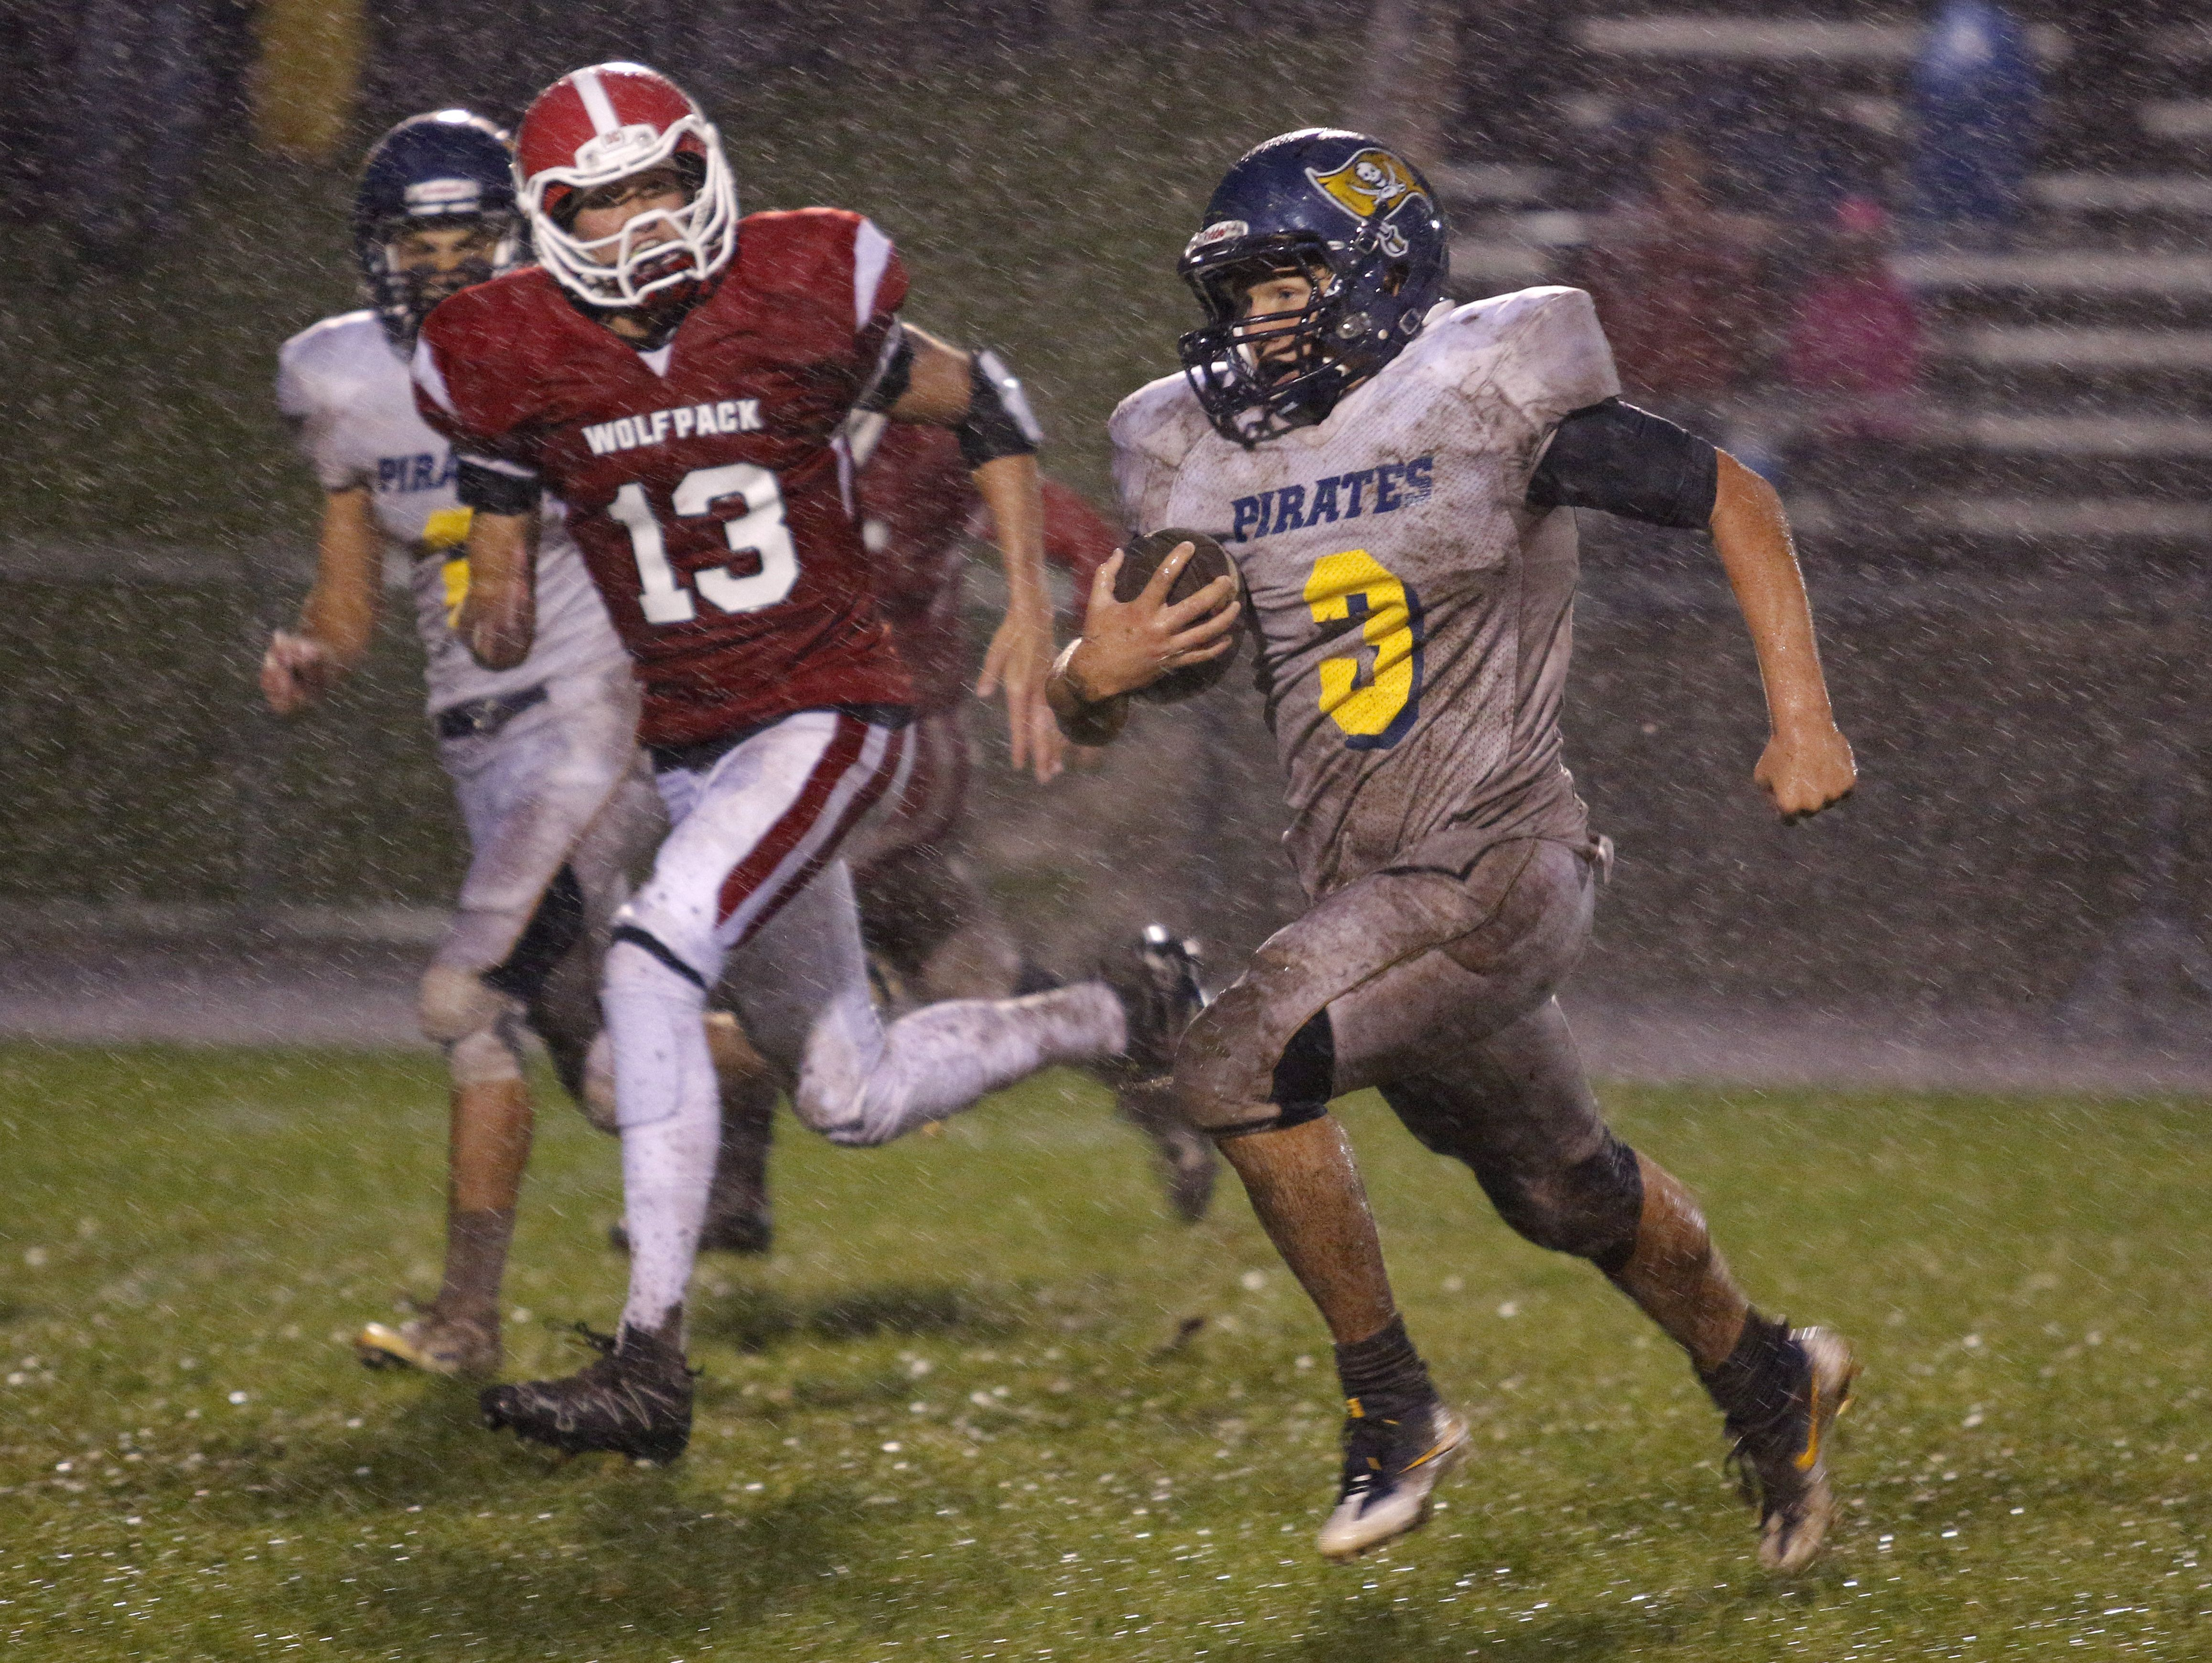 Pewamo-Westphalia quarterback Ryan Smith, right, runs for a touchdown on a keeper against Laingsburg's Jordan Jones (13) Friday, Sept. 30, 2016, in Laingsburg, Mich.